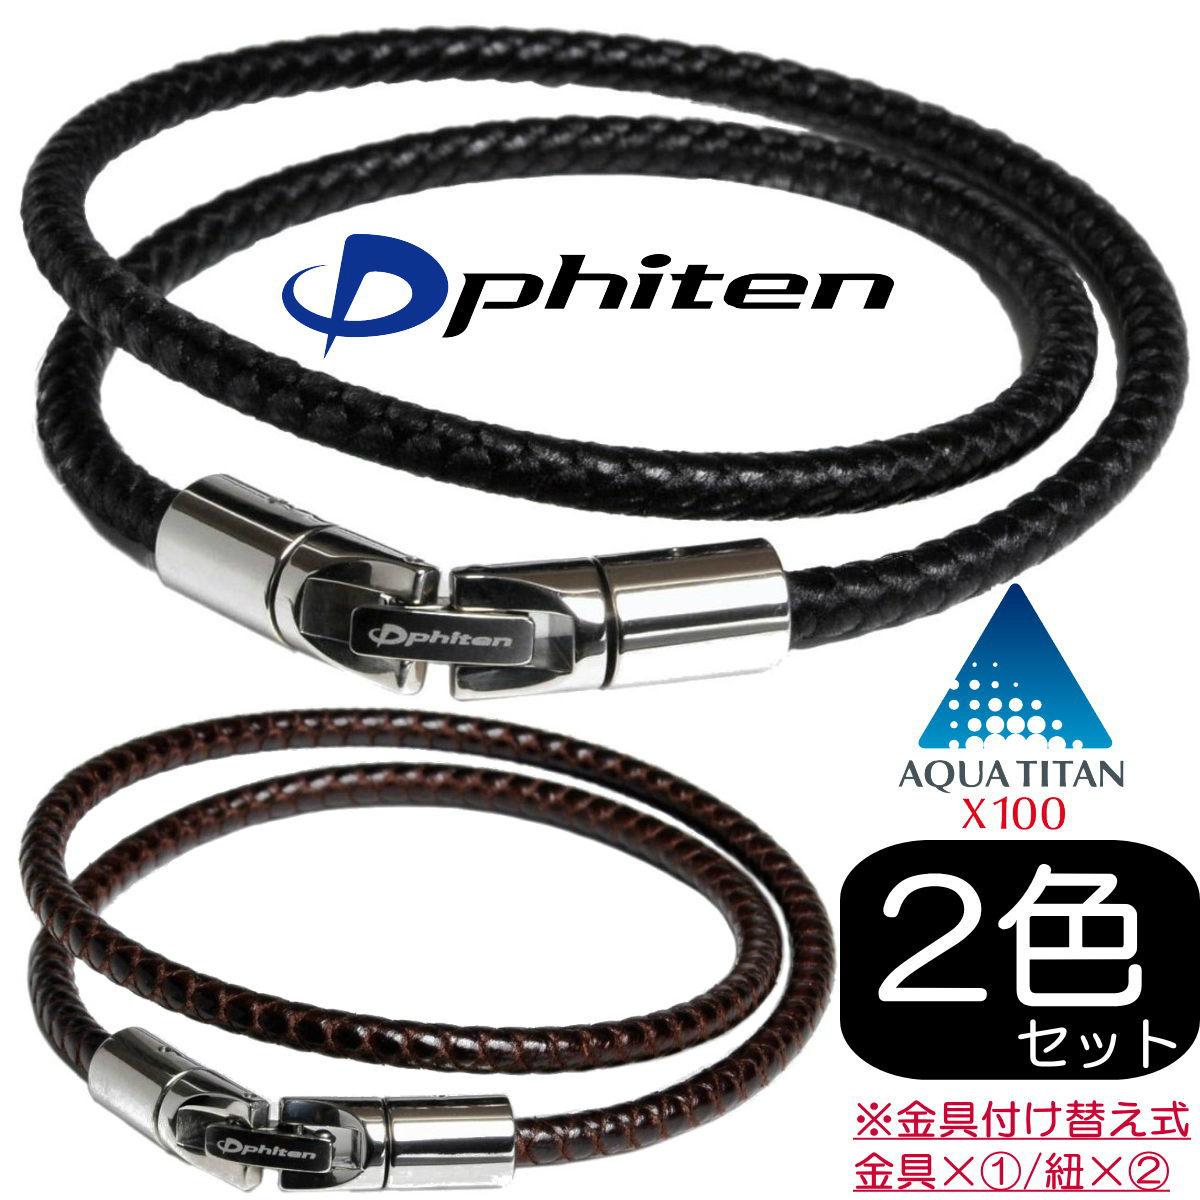 PHITEN RAKUWA breath X100 Leather Black Brown 2 color set 40cm 0310TG415001